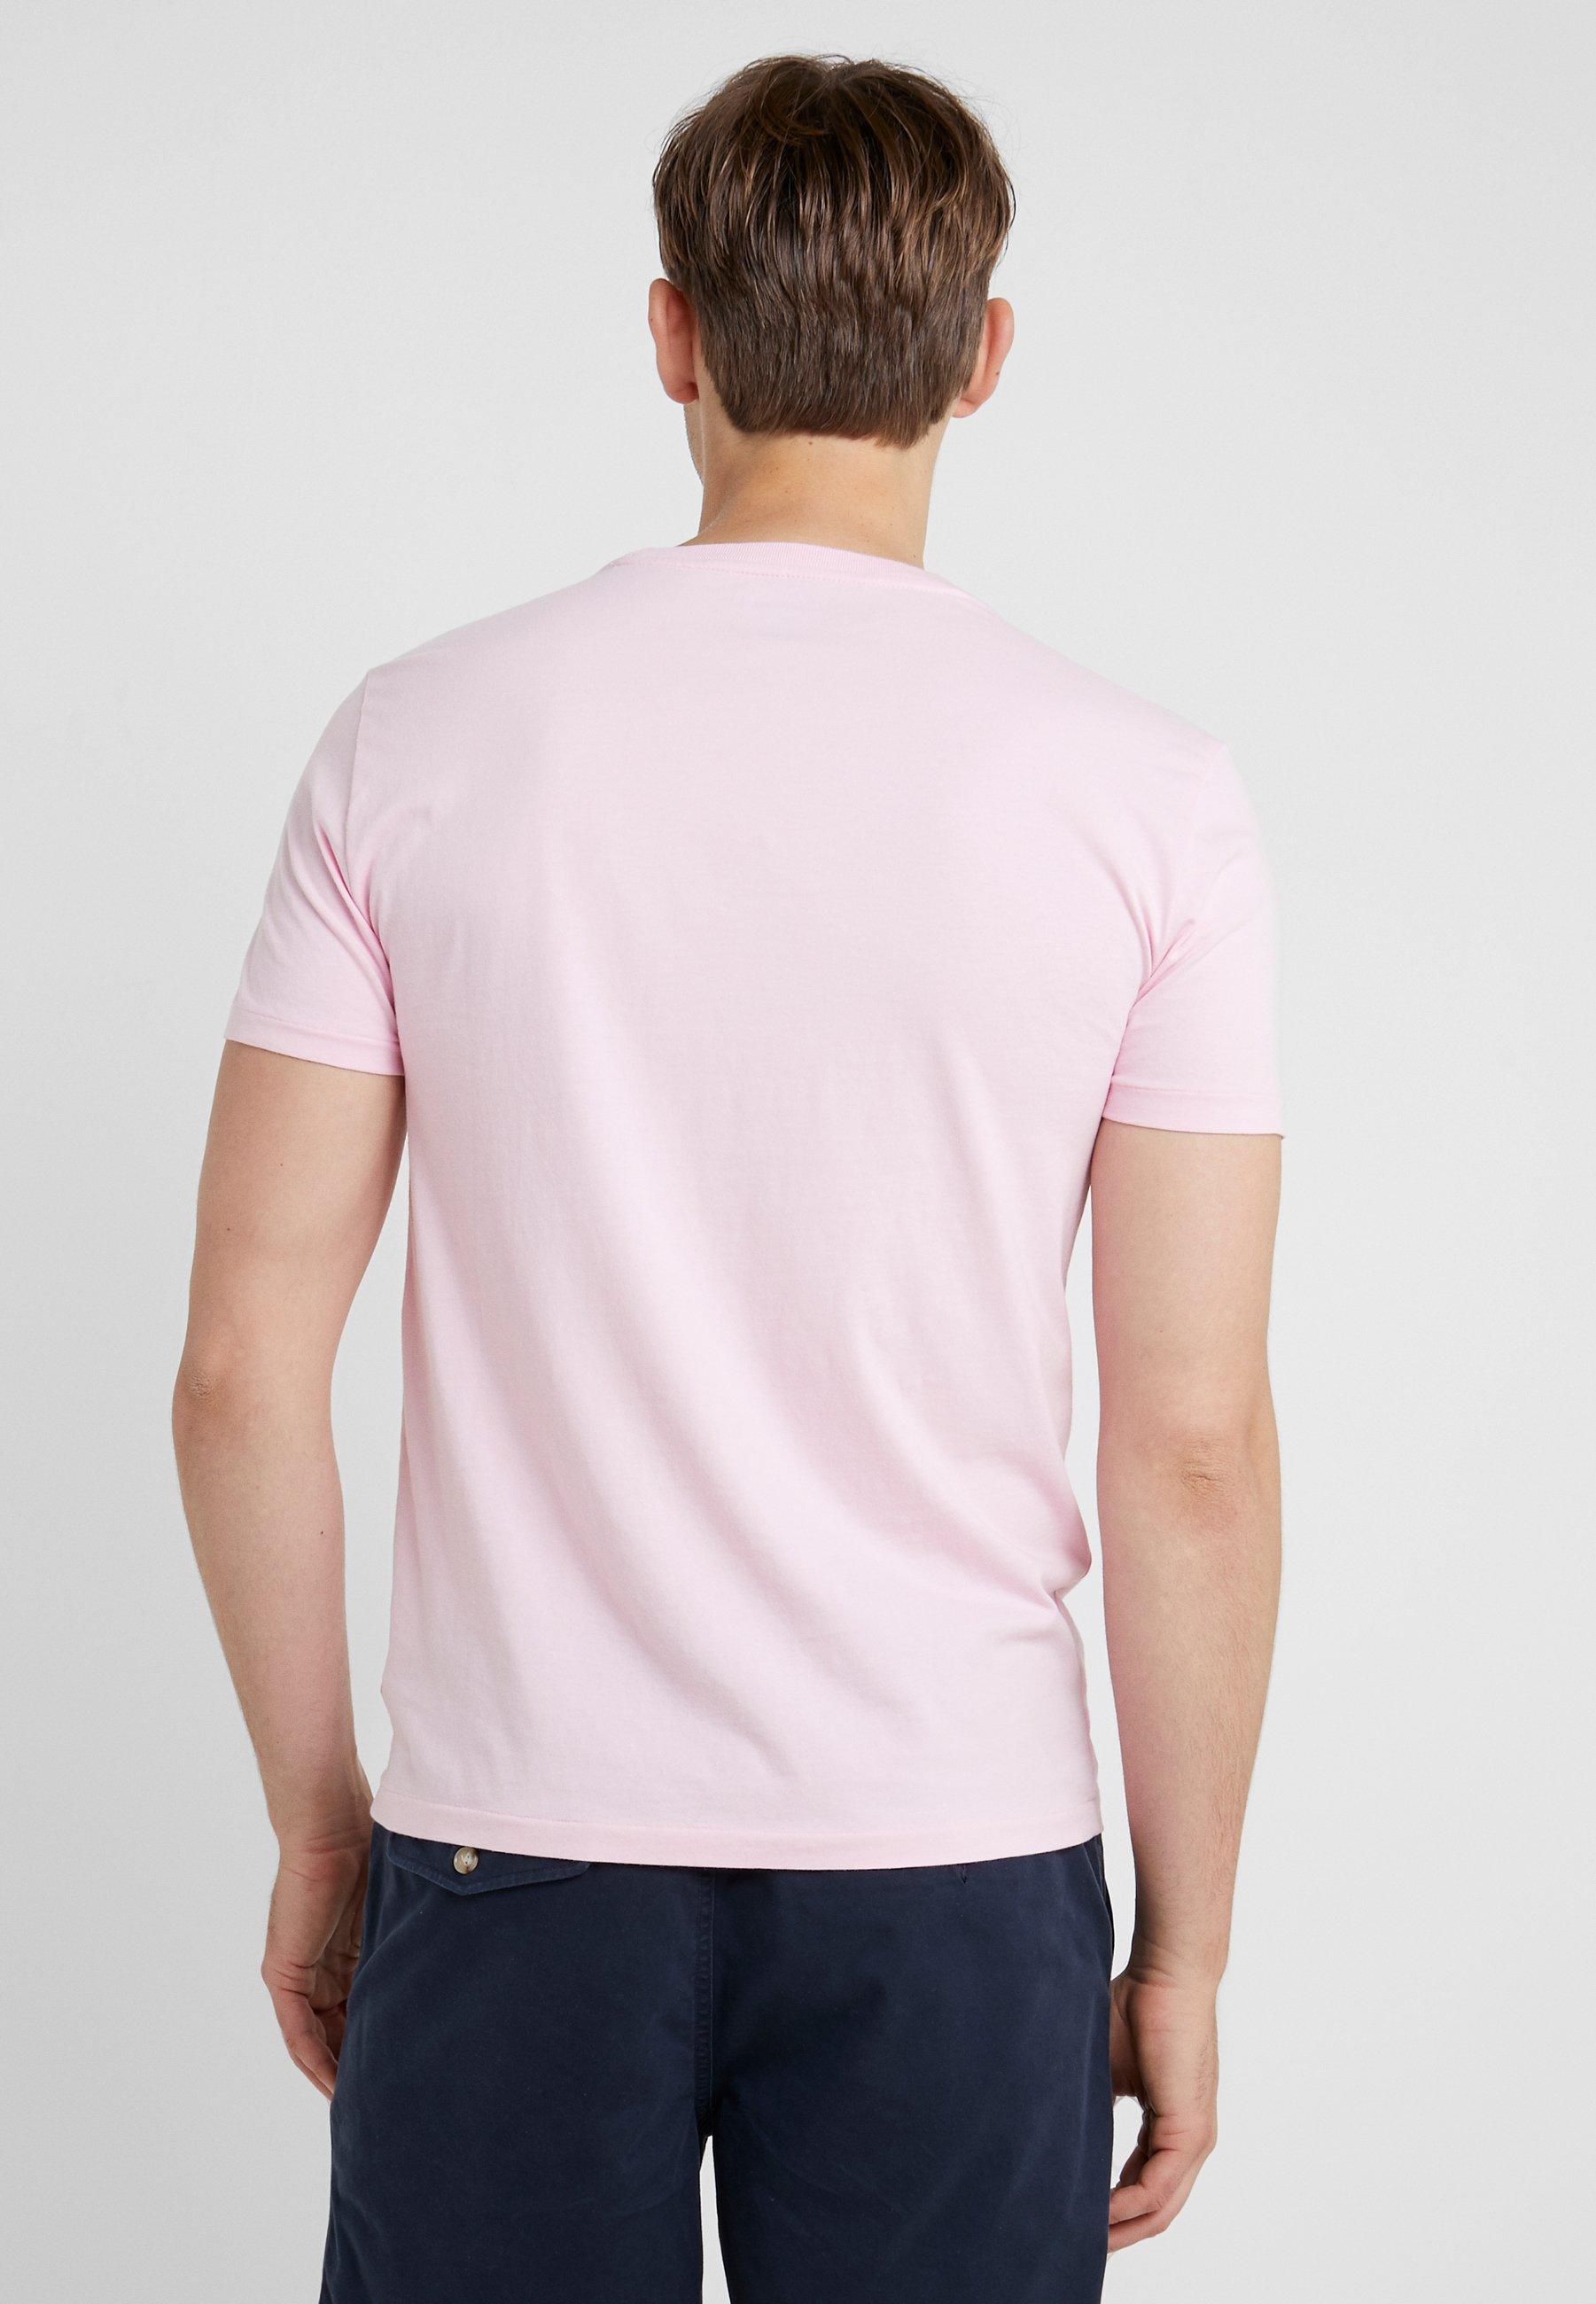 Slim FitT Polo Lauren shirt Ralph Carmel Pink Basic f7Ybgy6